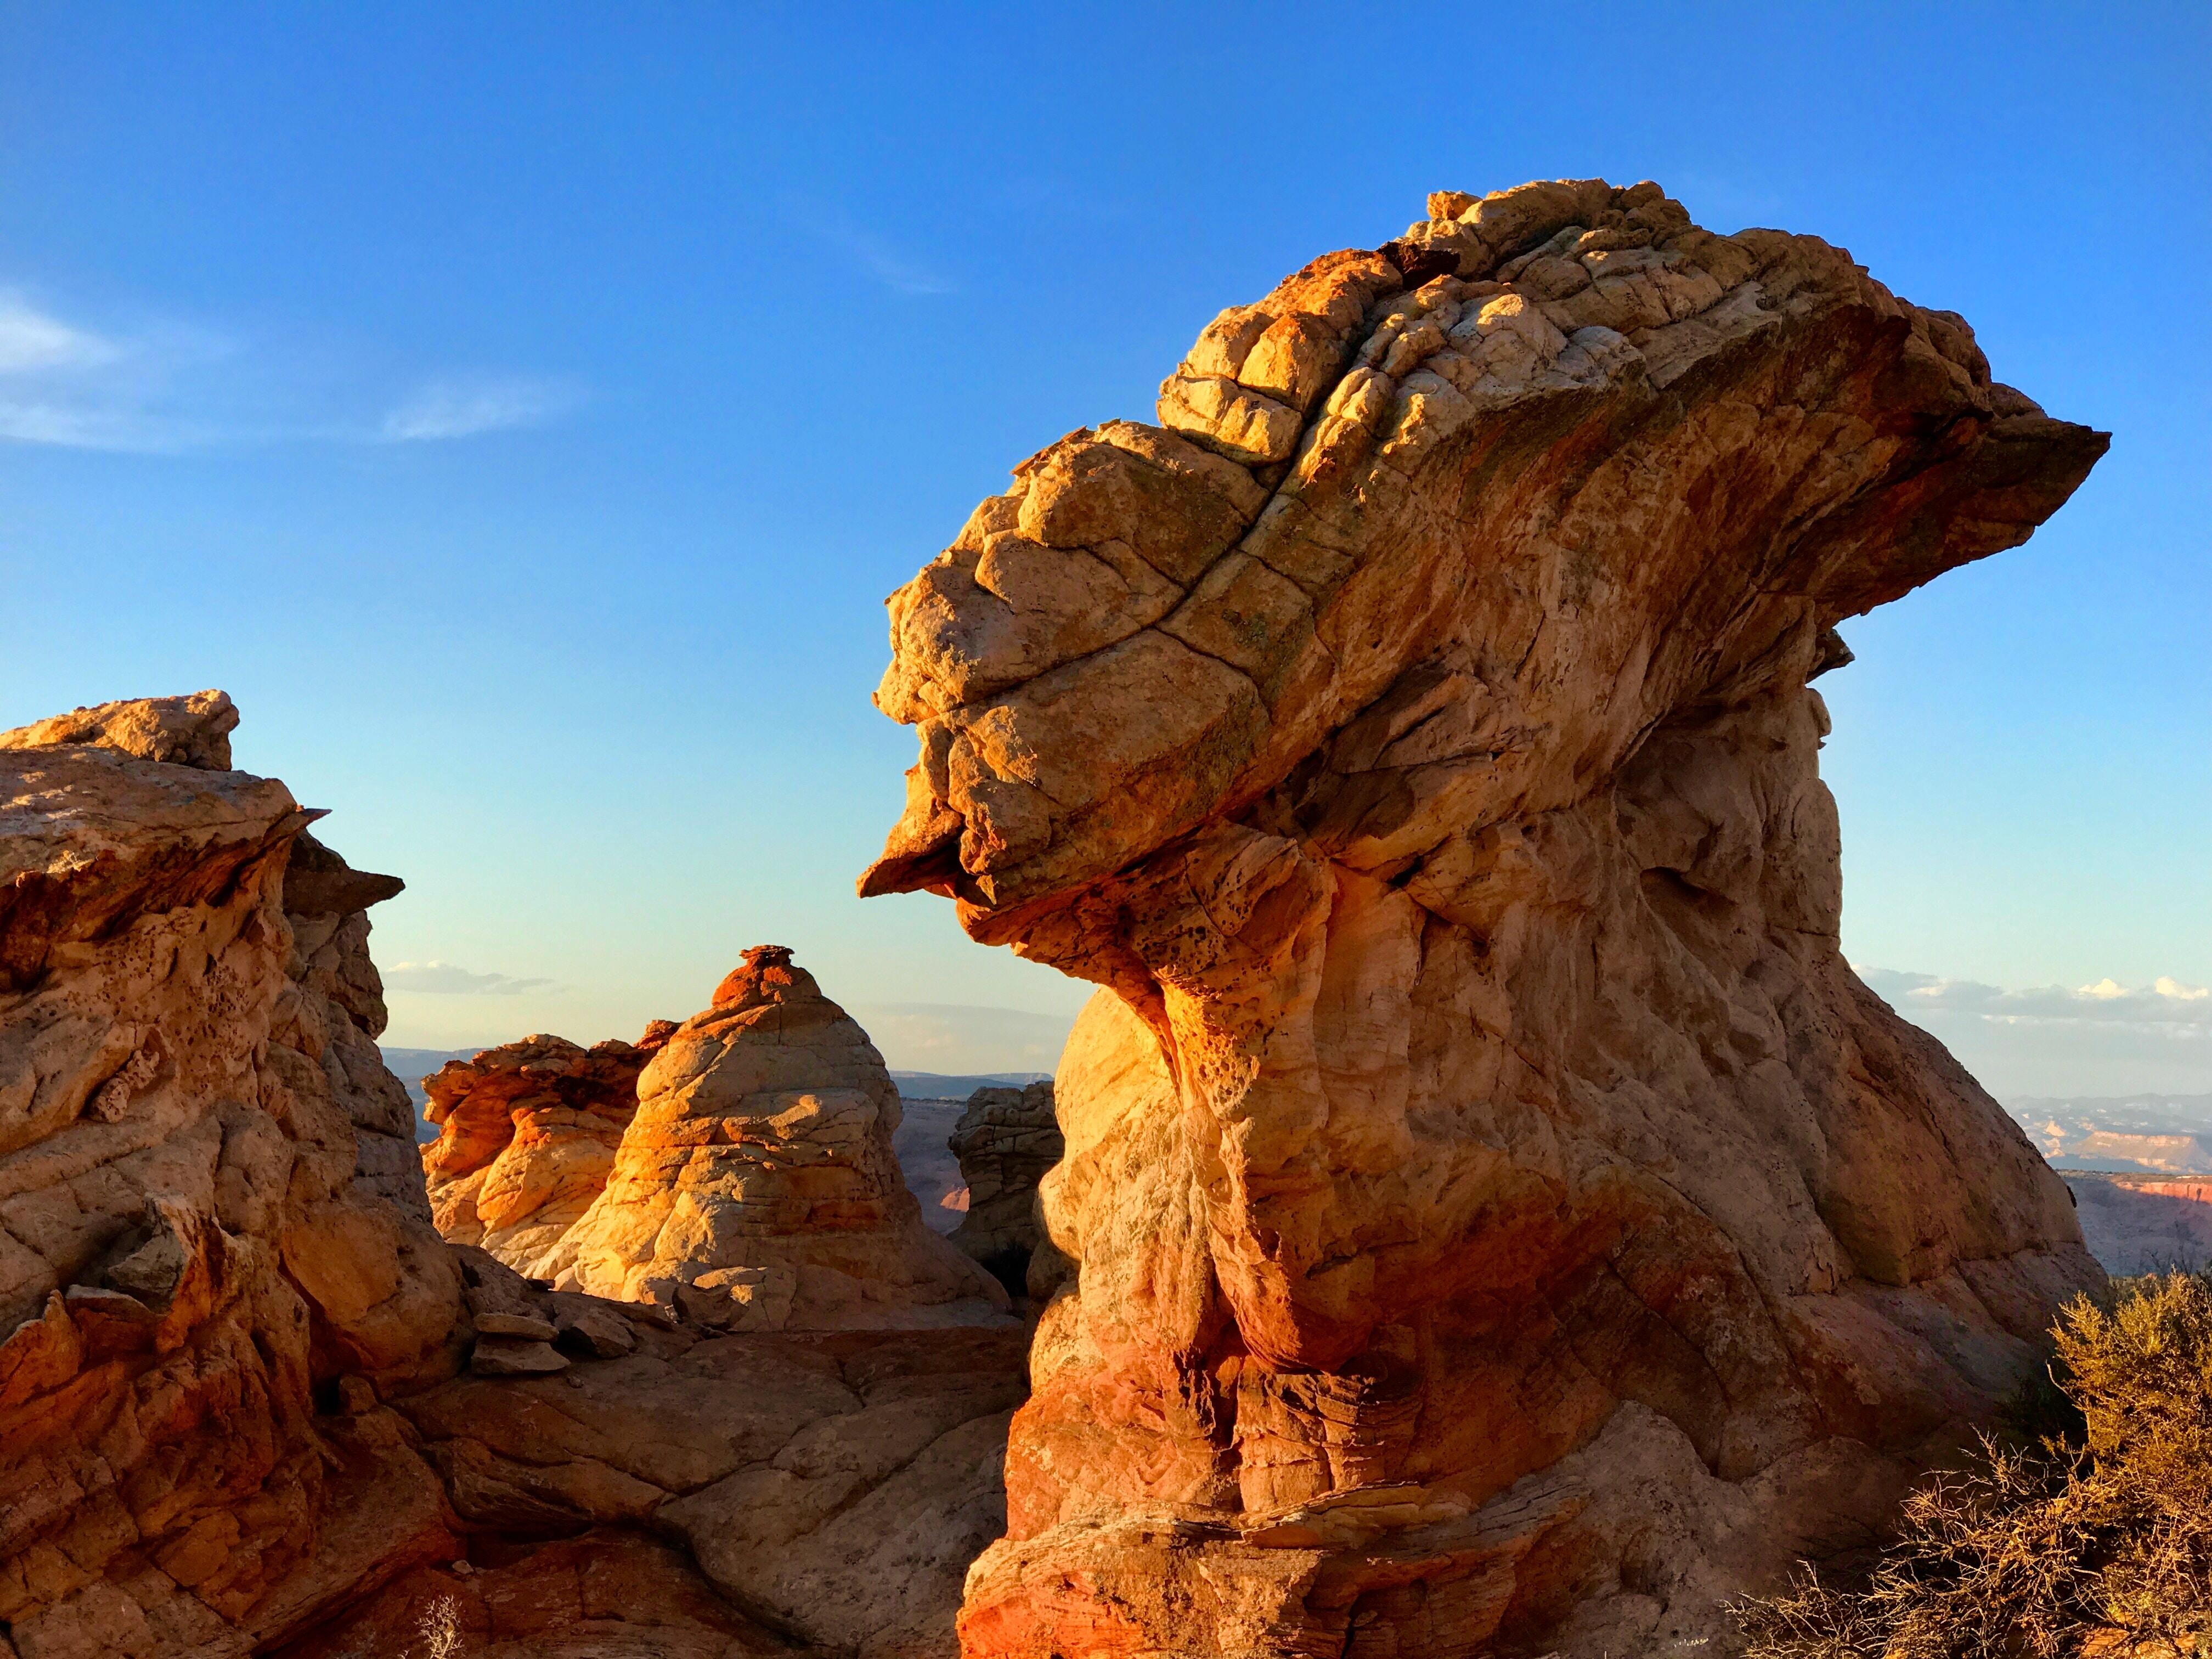 landscape photo of rock formation